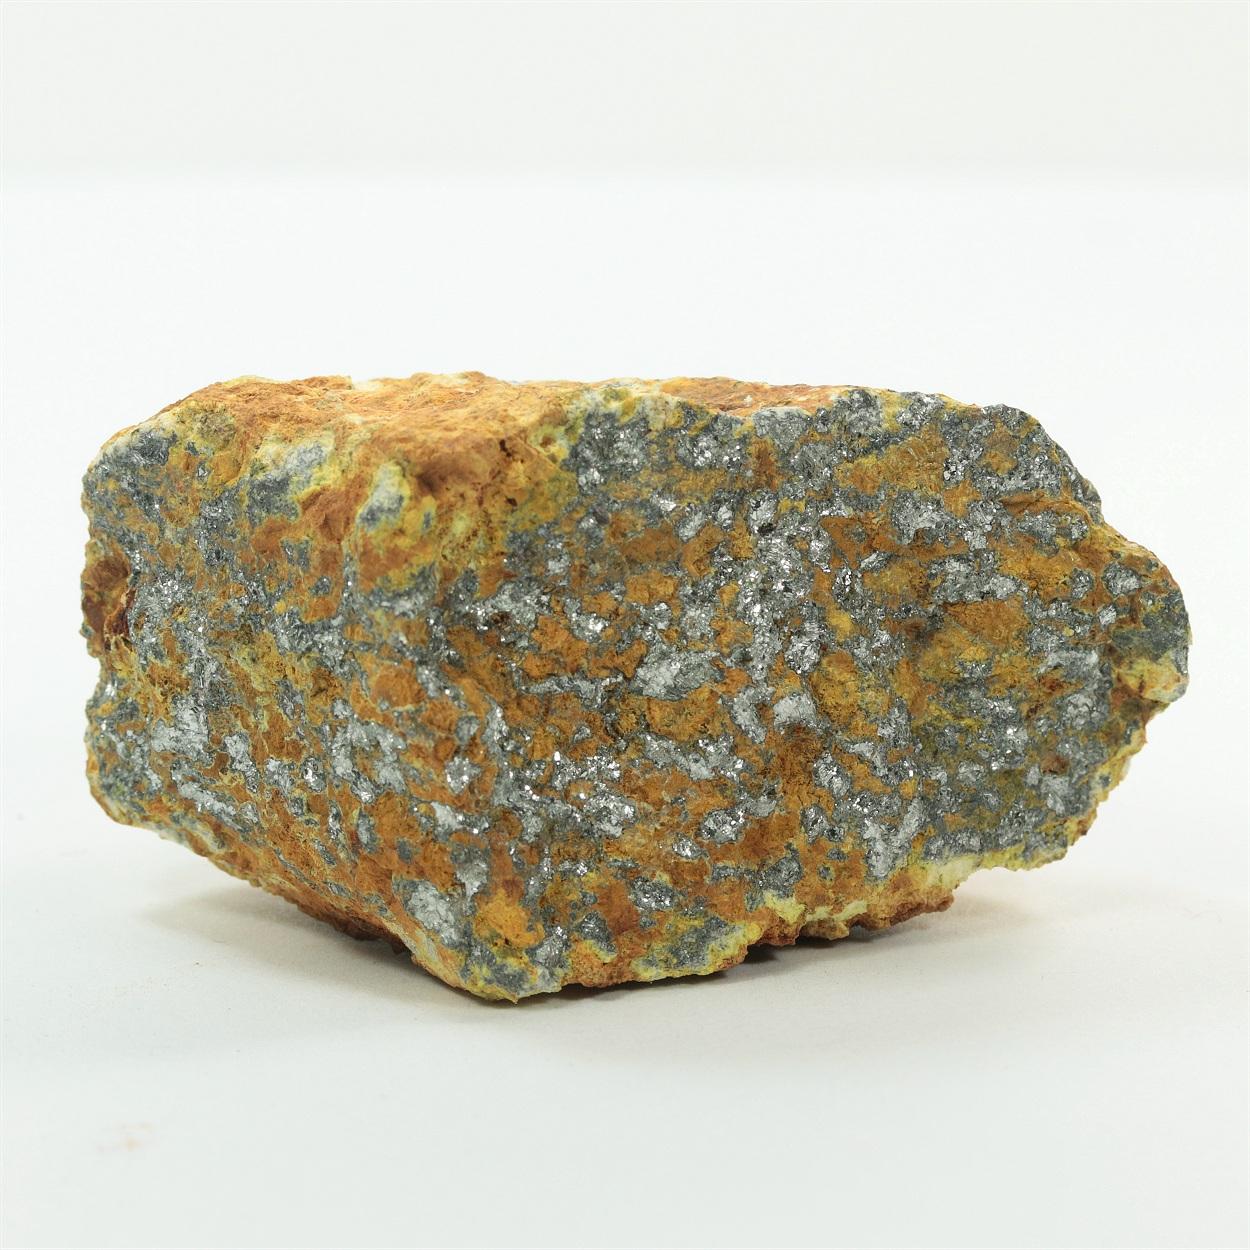 Native Antimony With Stibiconite